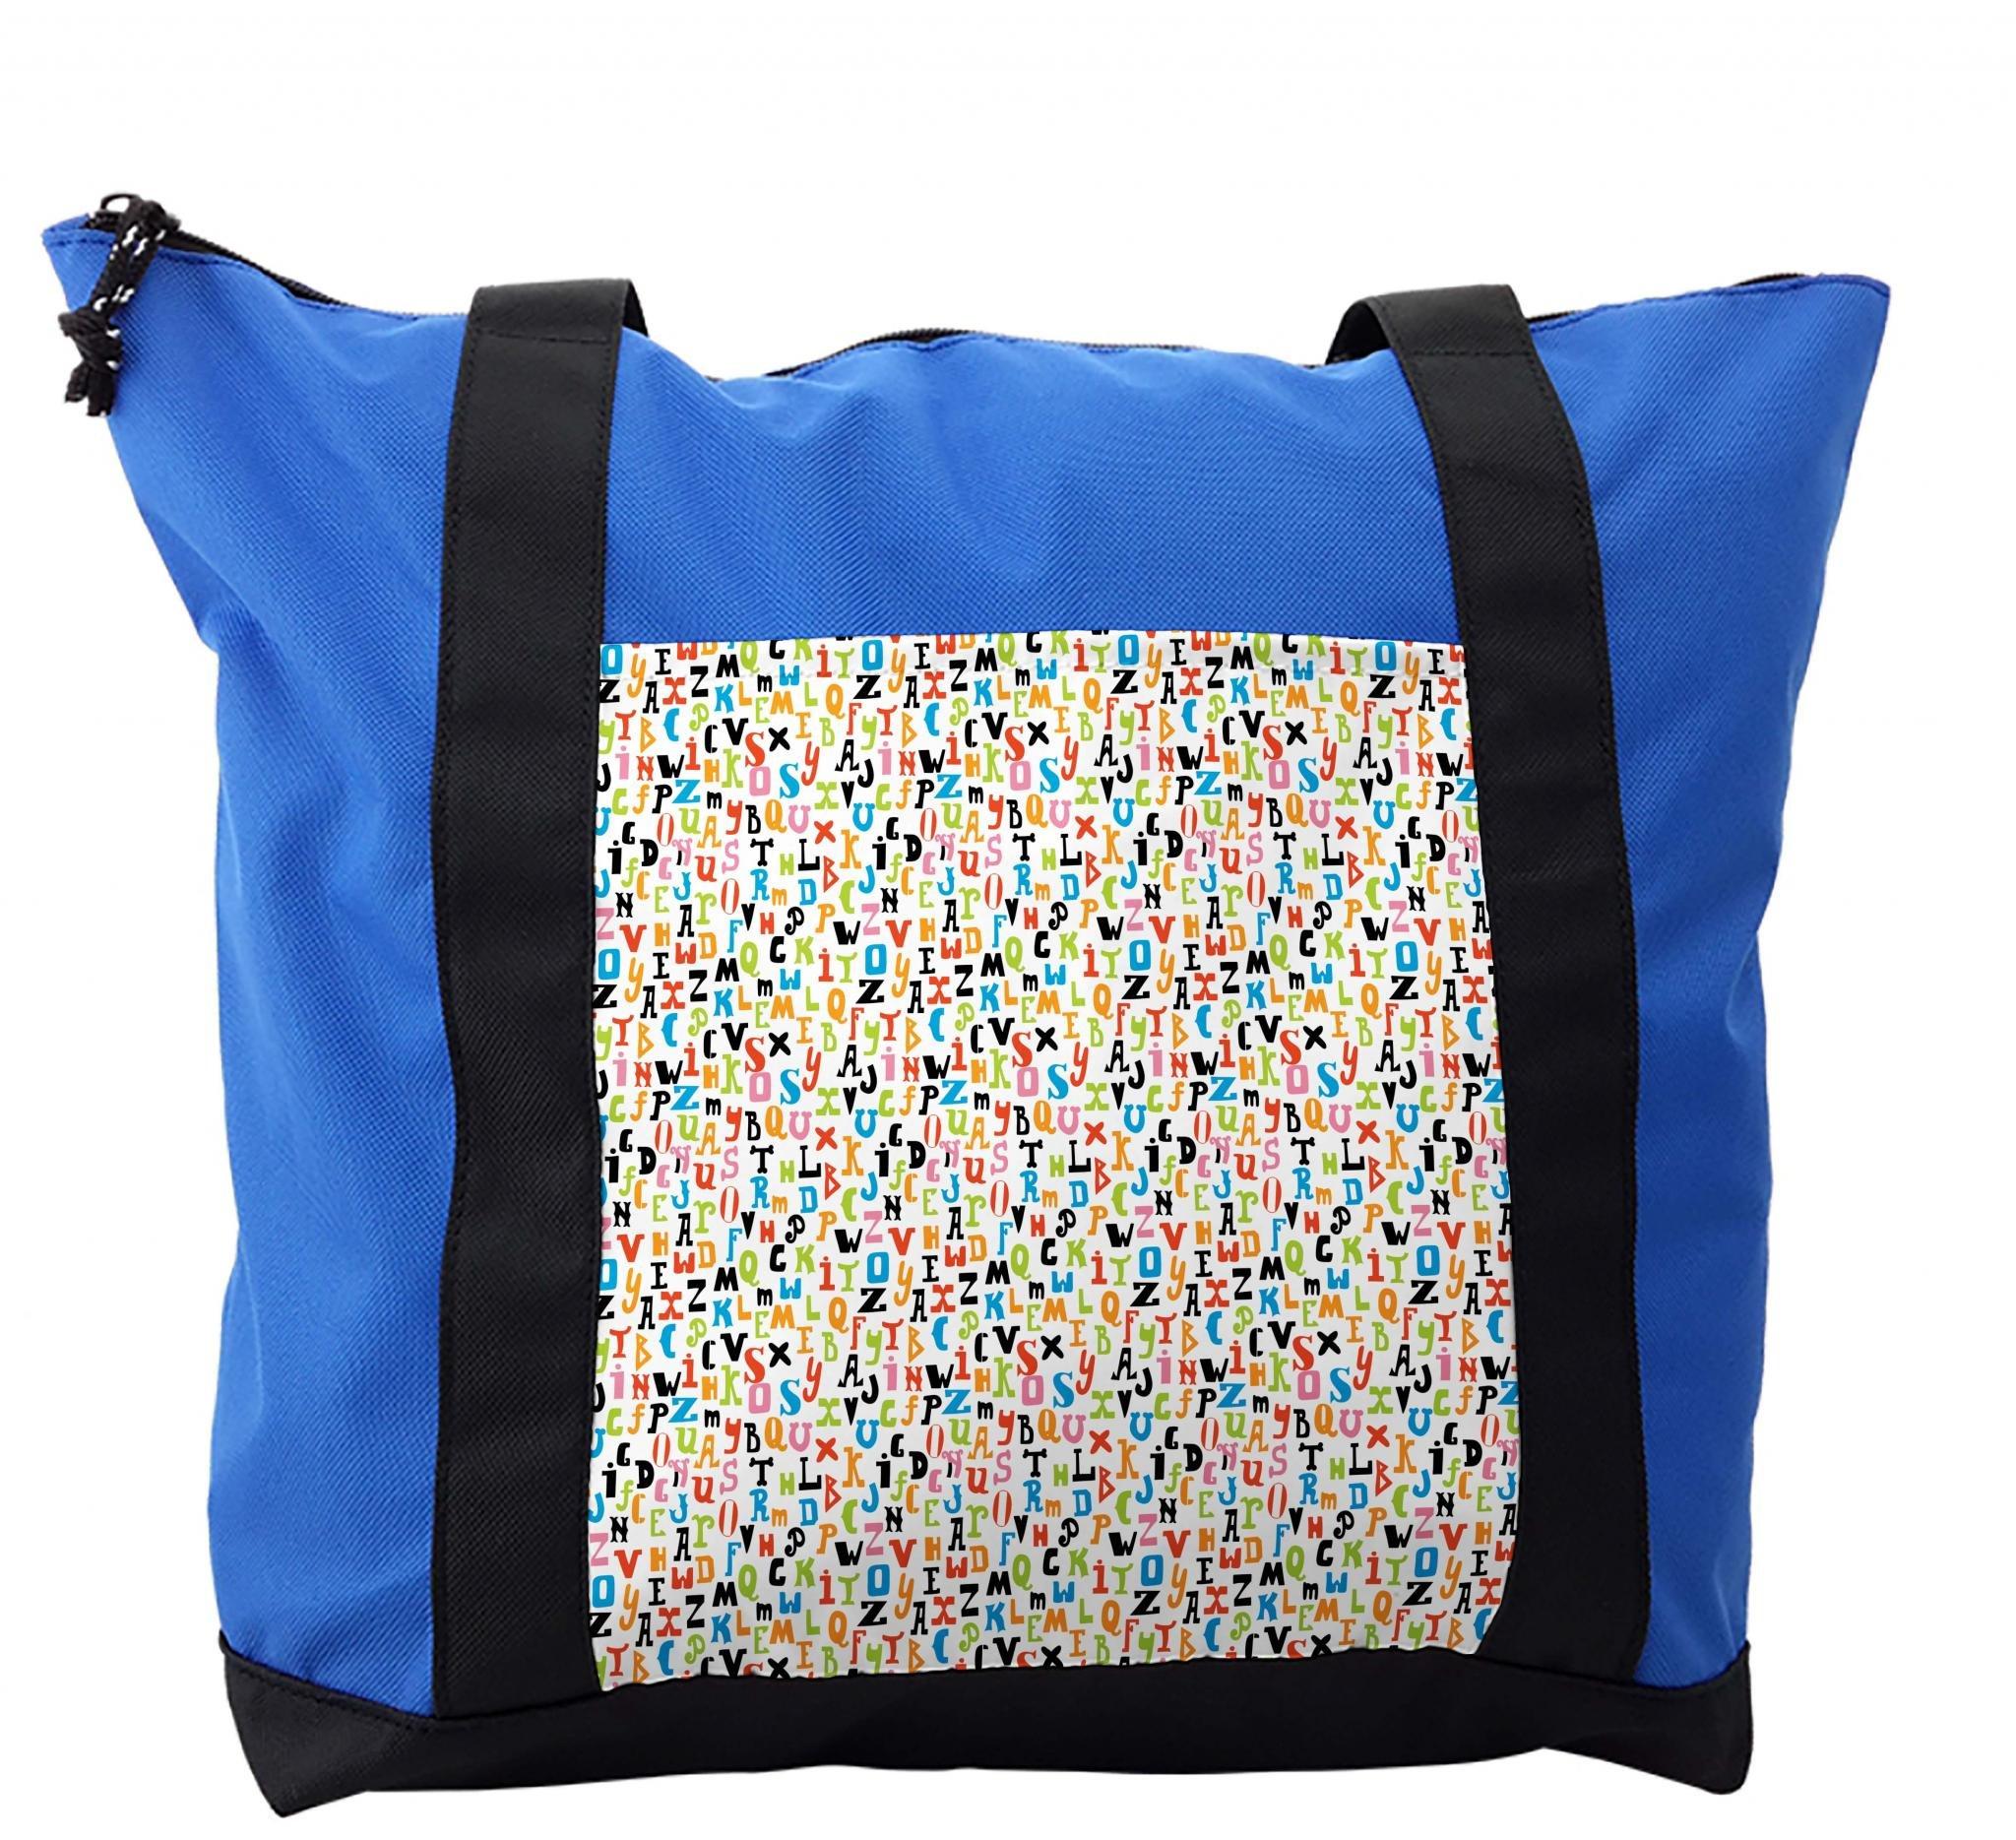 Lunarable ABC Kids Shoulder Bag, Letters Funny Colorful, Durable with Zipper